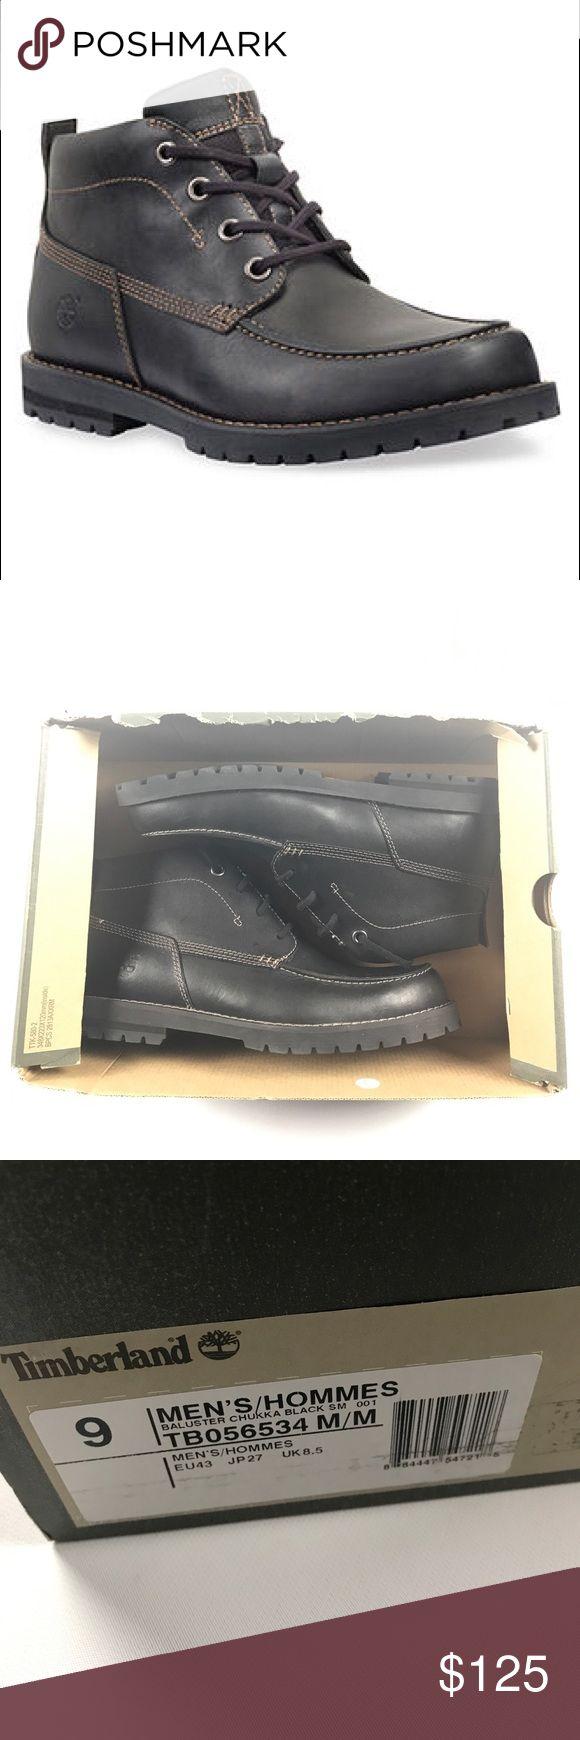 New 9 Timberland Baluster Chukka Boots Black New Timberland Shoes Chukka Boots